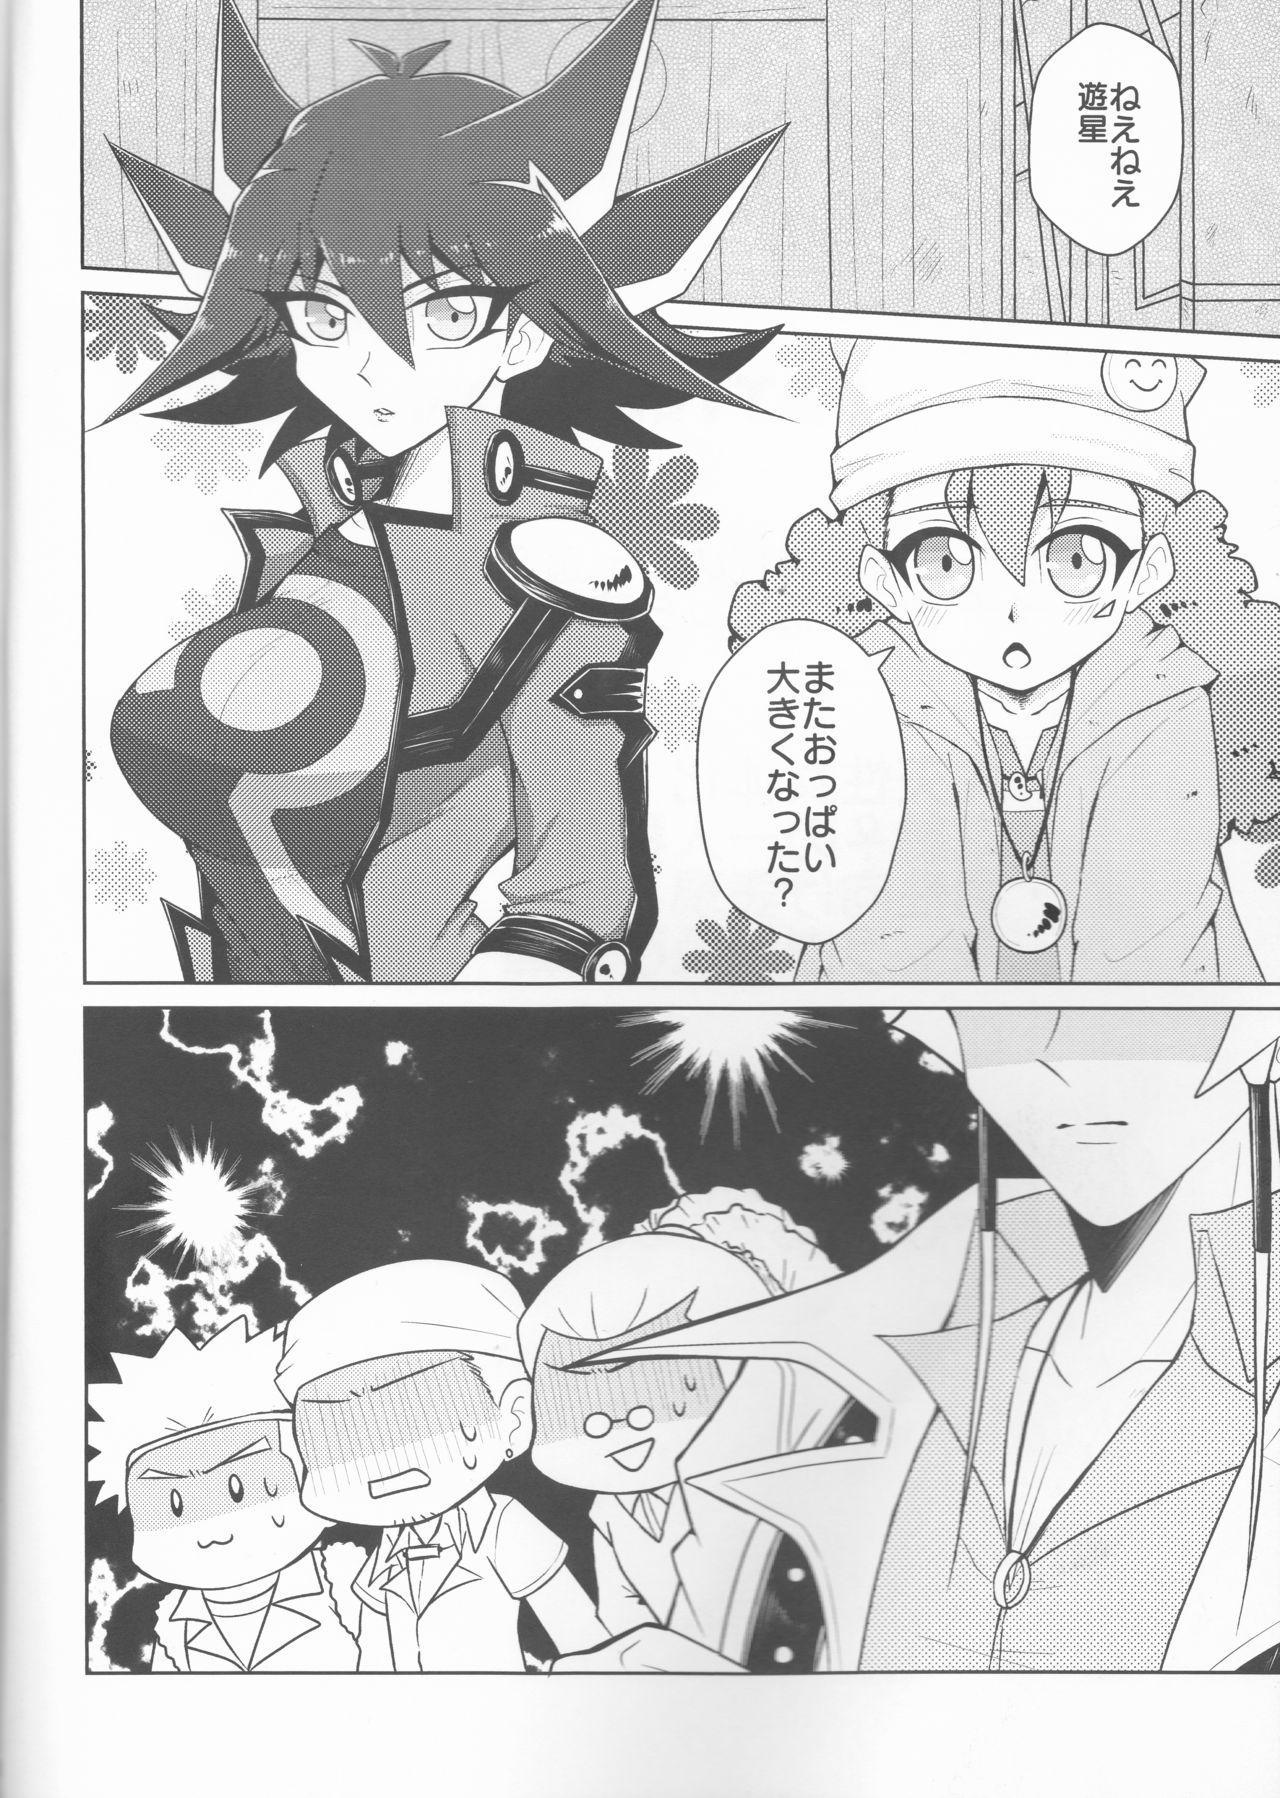 (Chou Ore no Turn 2019) [KINOPOTION (Take Nameko)] King (Mi) to Yusei-chan ♀ (Yu-Gi-Oh! 5D's) 3